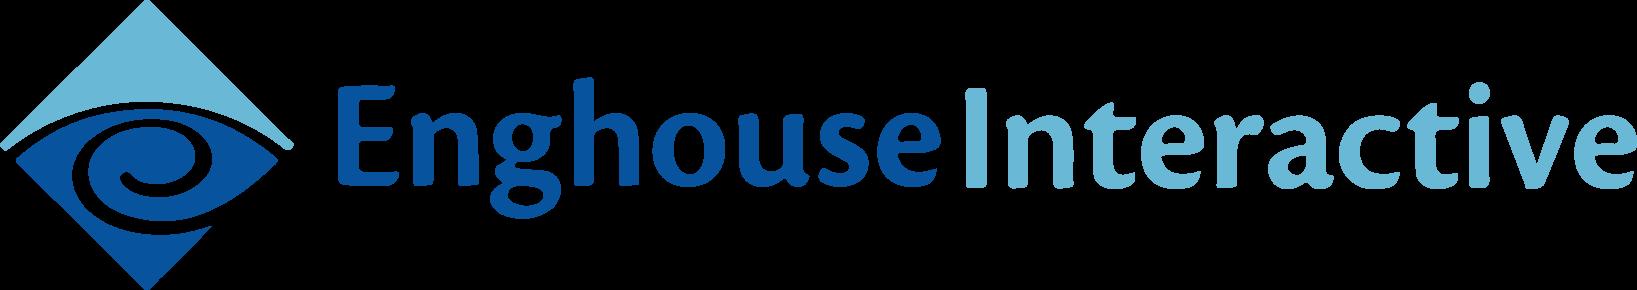 Enghouse Interactive Americas